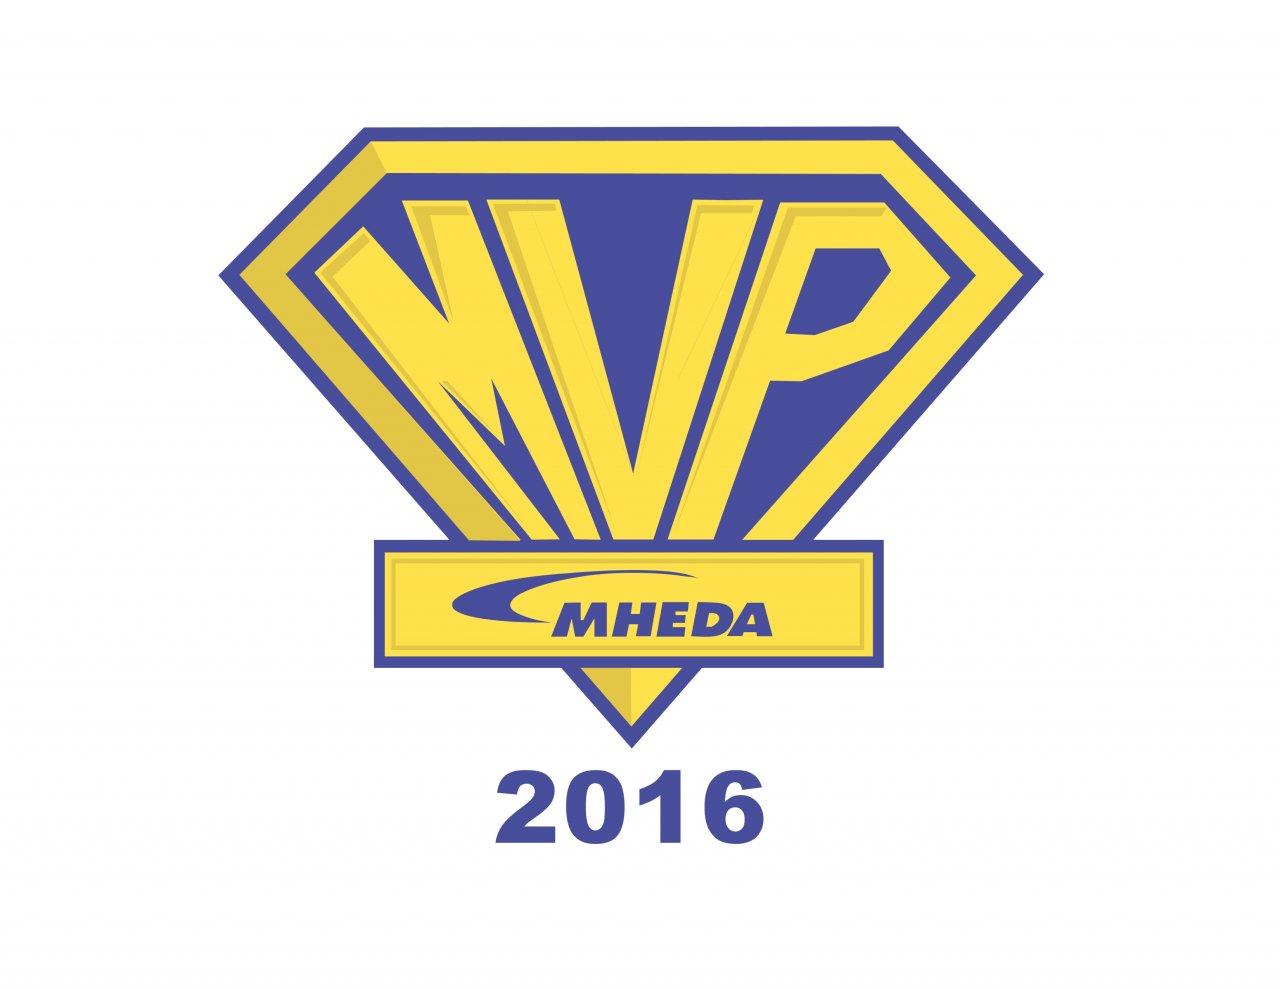 MHEDA MVP 2016